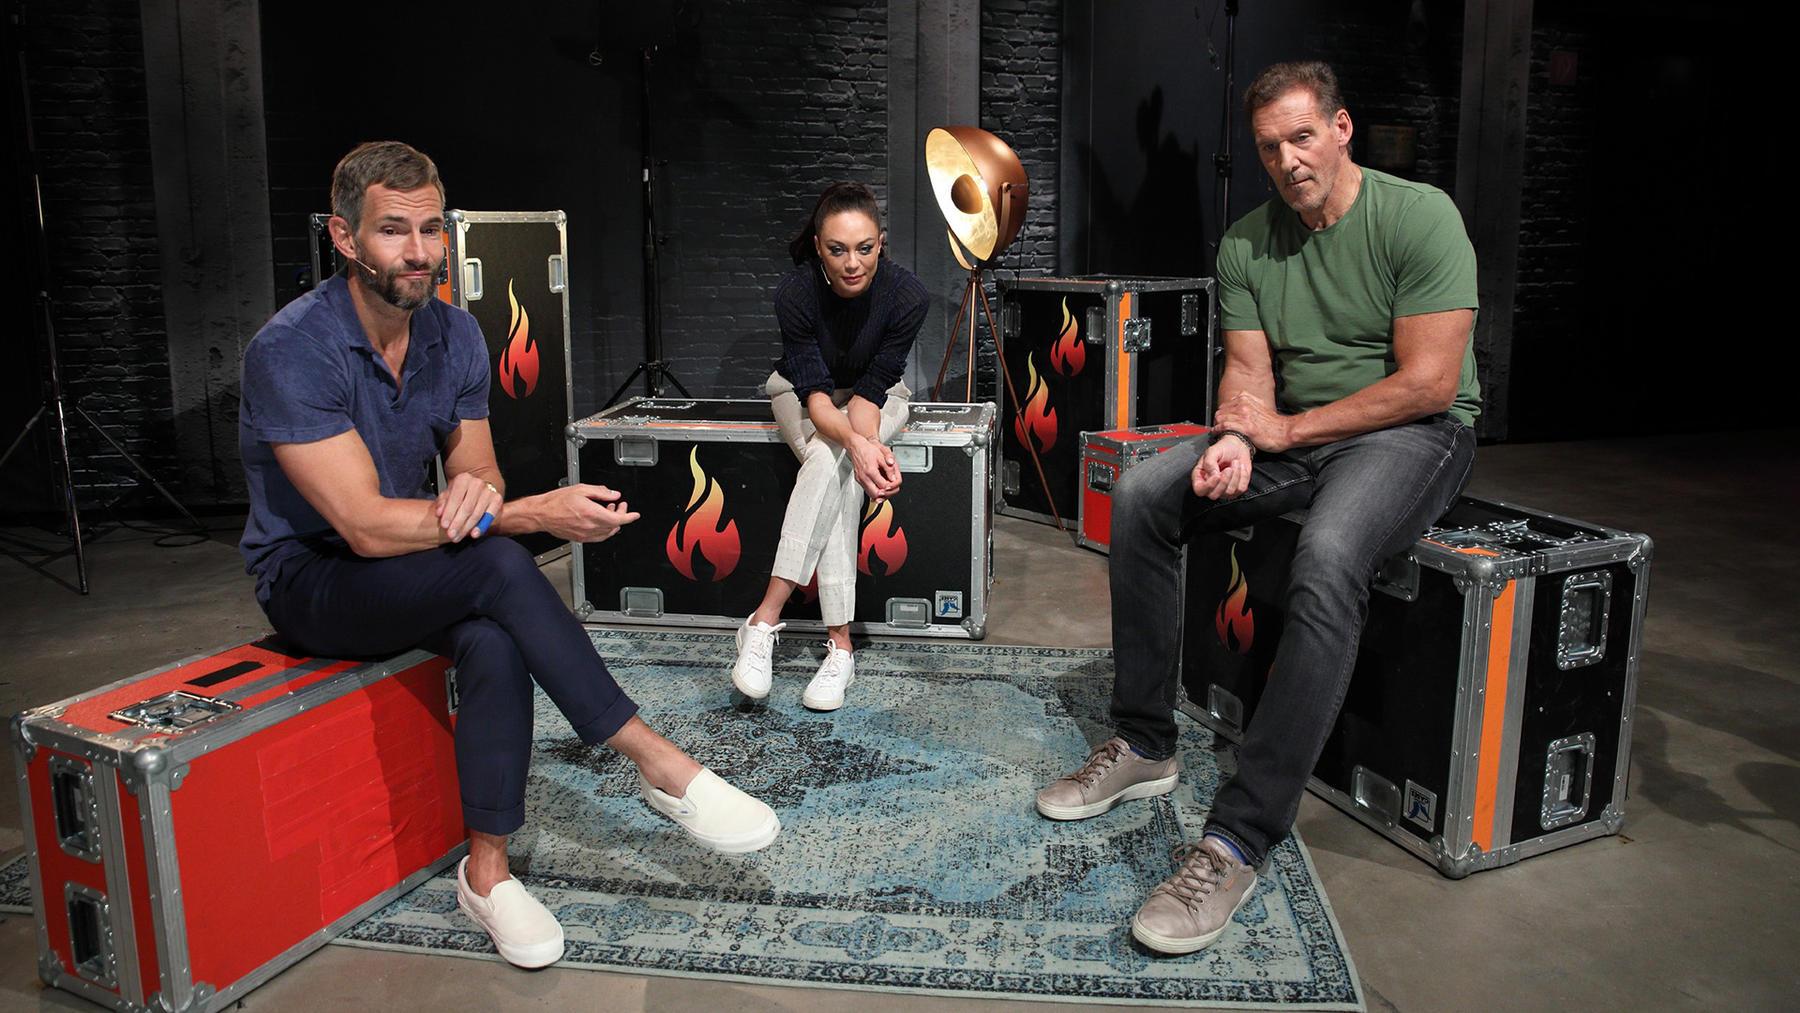 Gäste: Micky Beisenherz, Ralf Möller, Lilly Becker